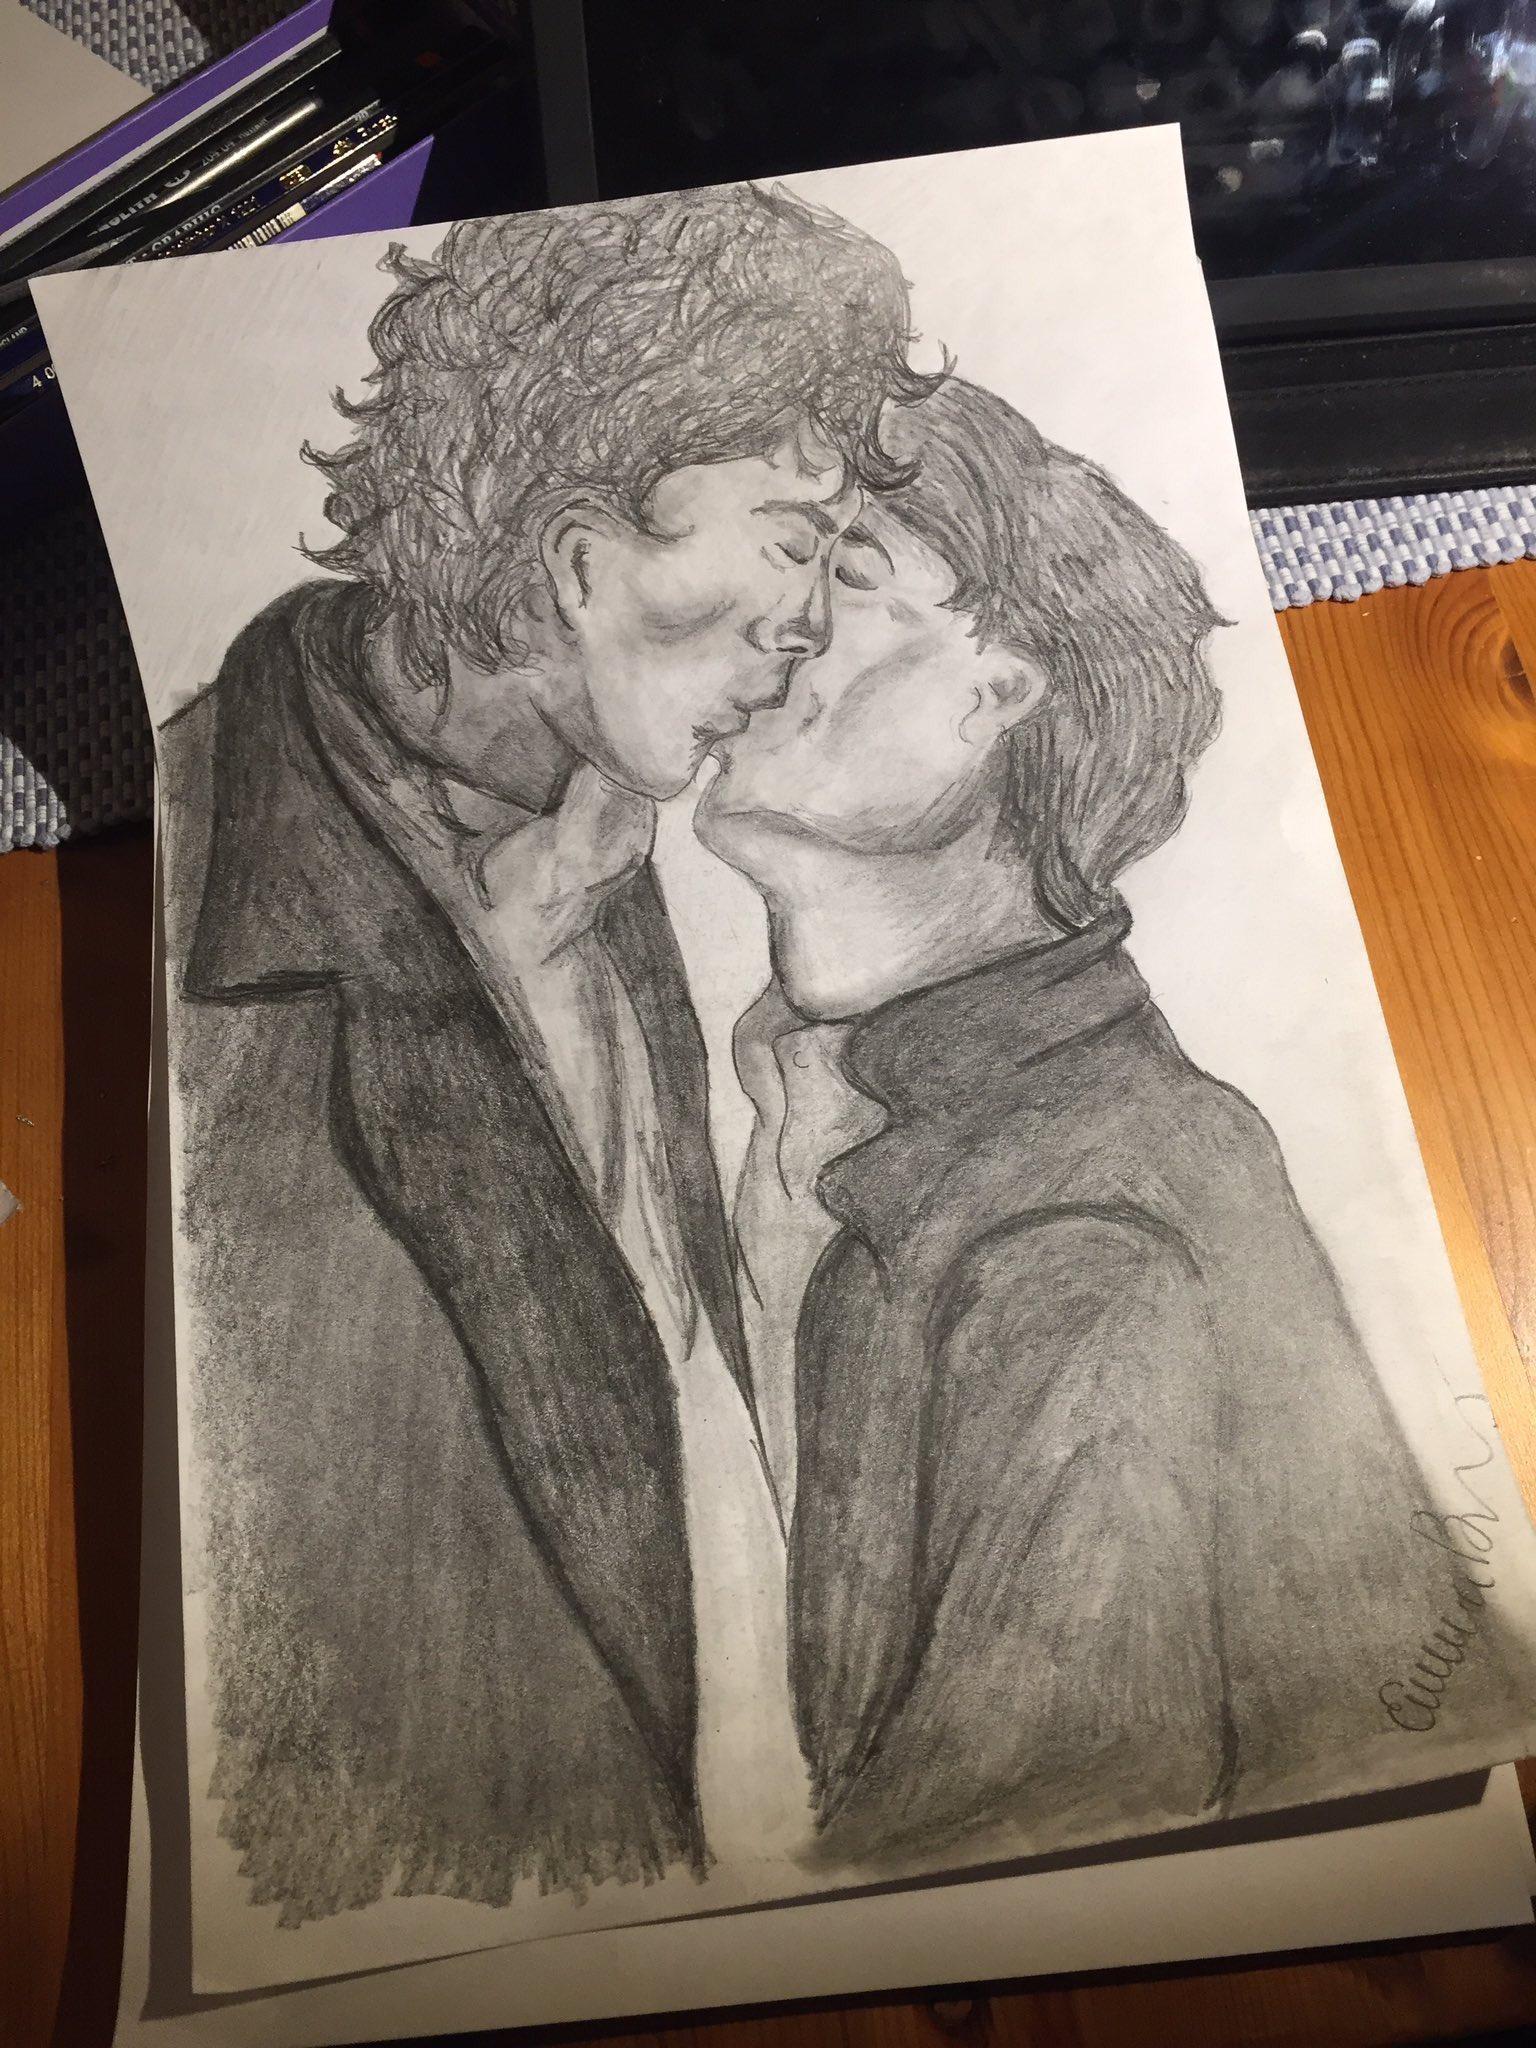 A little bit of #JohnLock #SherlockLove drawn by the talented @SymphonyOnMute for our #FanArtFriday #FeaturedArt! 🤗❤ #Sherlock #fanart https://t.co/B6mMl1G15a